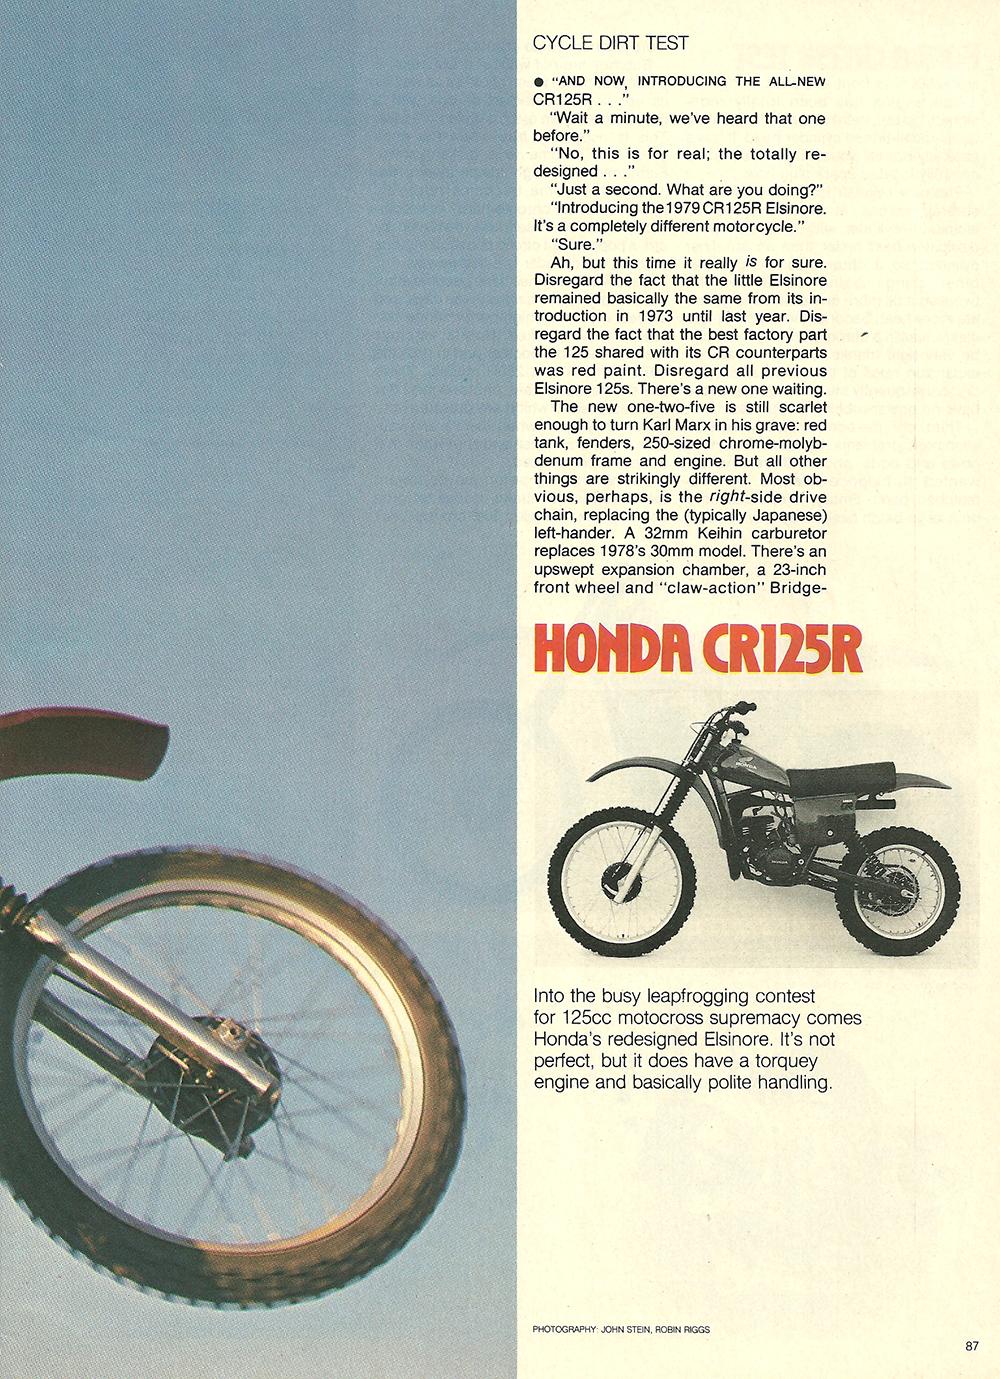 1979 Honda CR125R road test 02.jpg